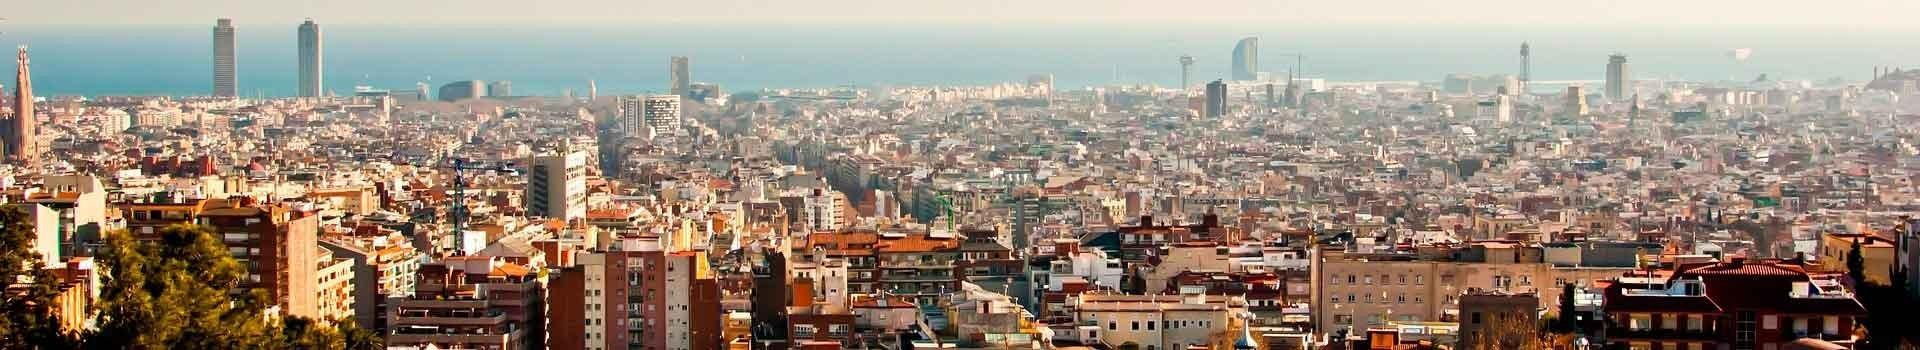 Sant boi de llobregat barcelona spain tourismembassy - Sofas sant boi de llobregat ...